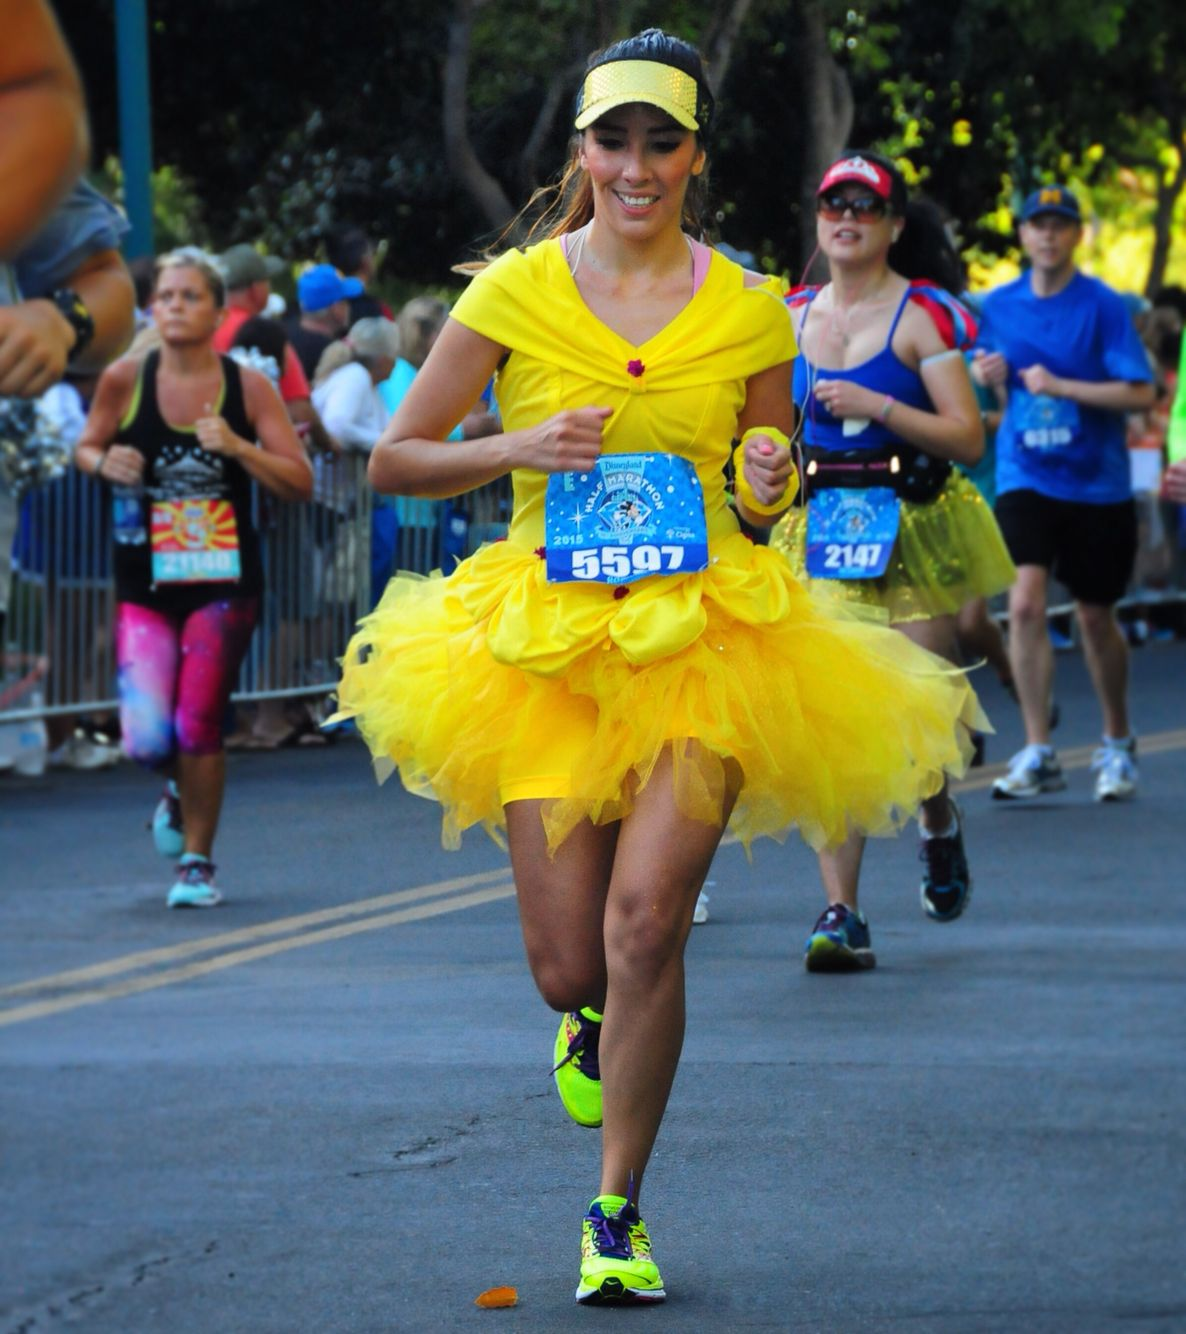 princess belle running costume rundisney 2015